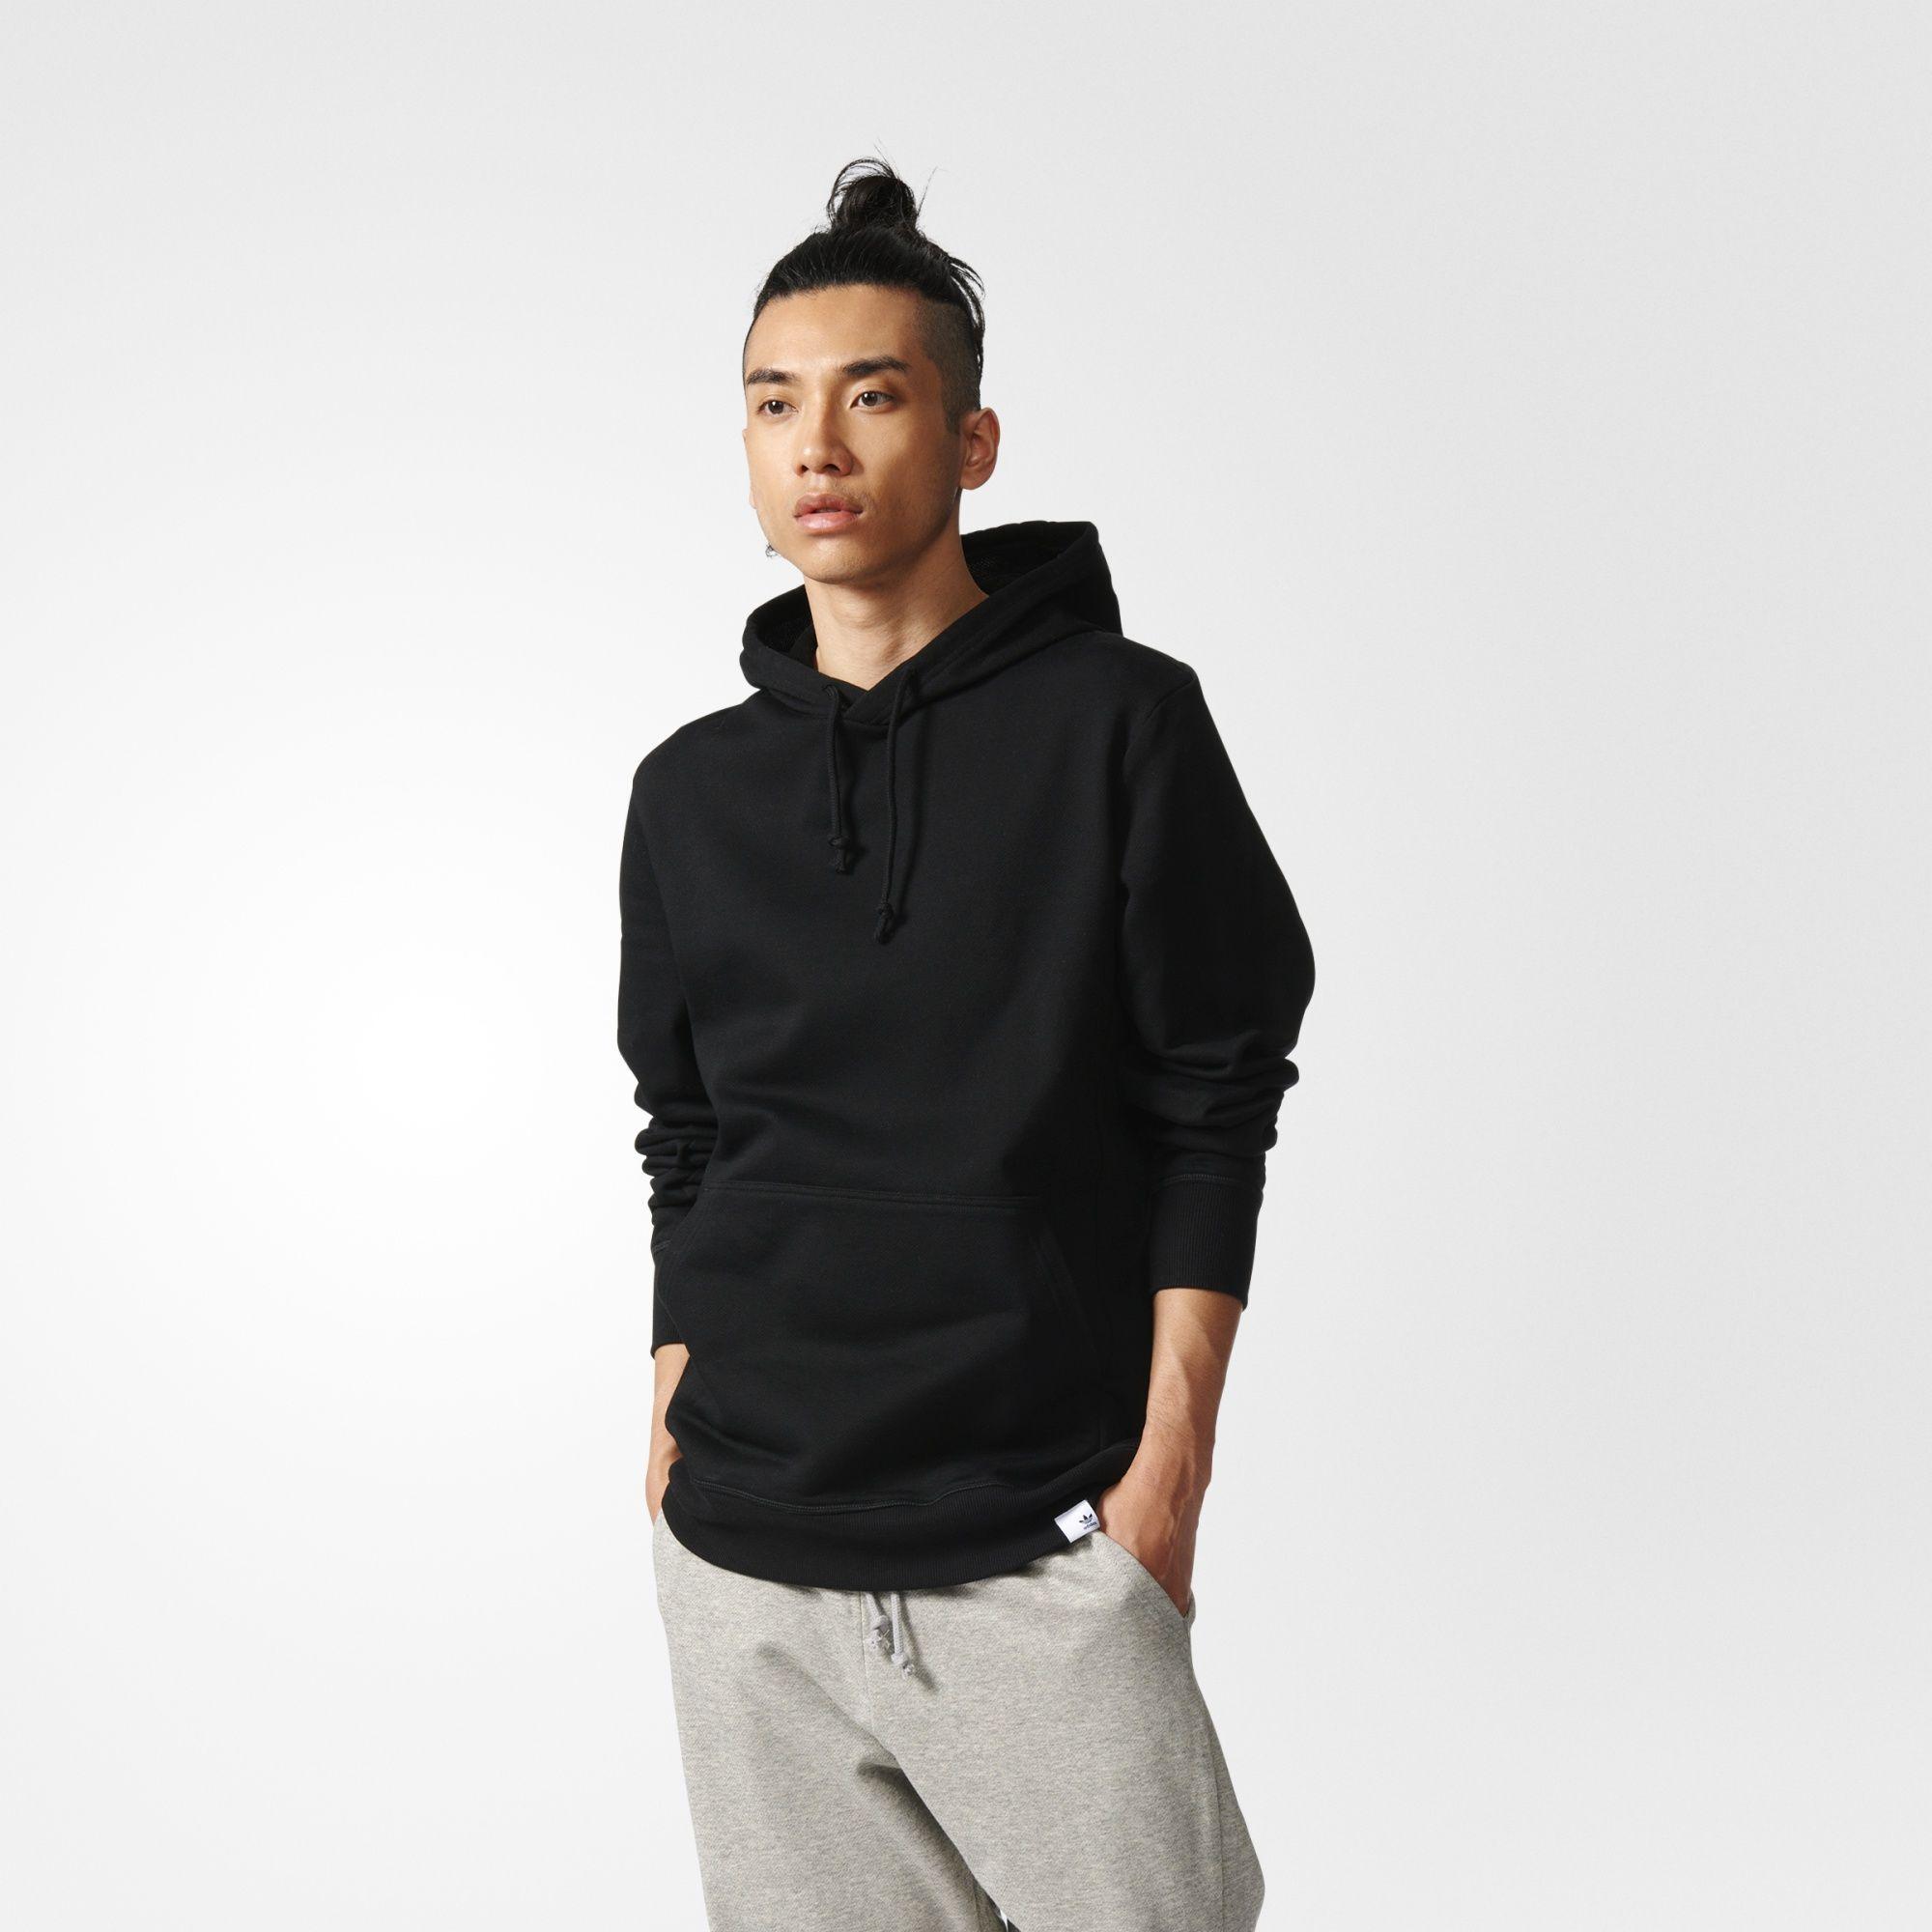 Adidas UK Shop - Adidas XbyO Pullover (Black) for Men